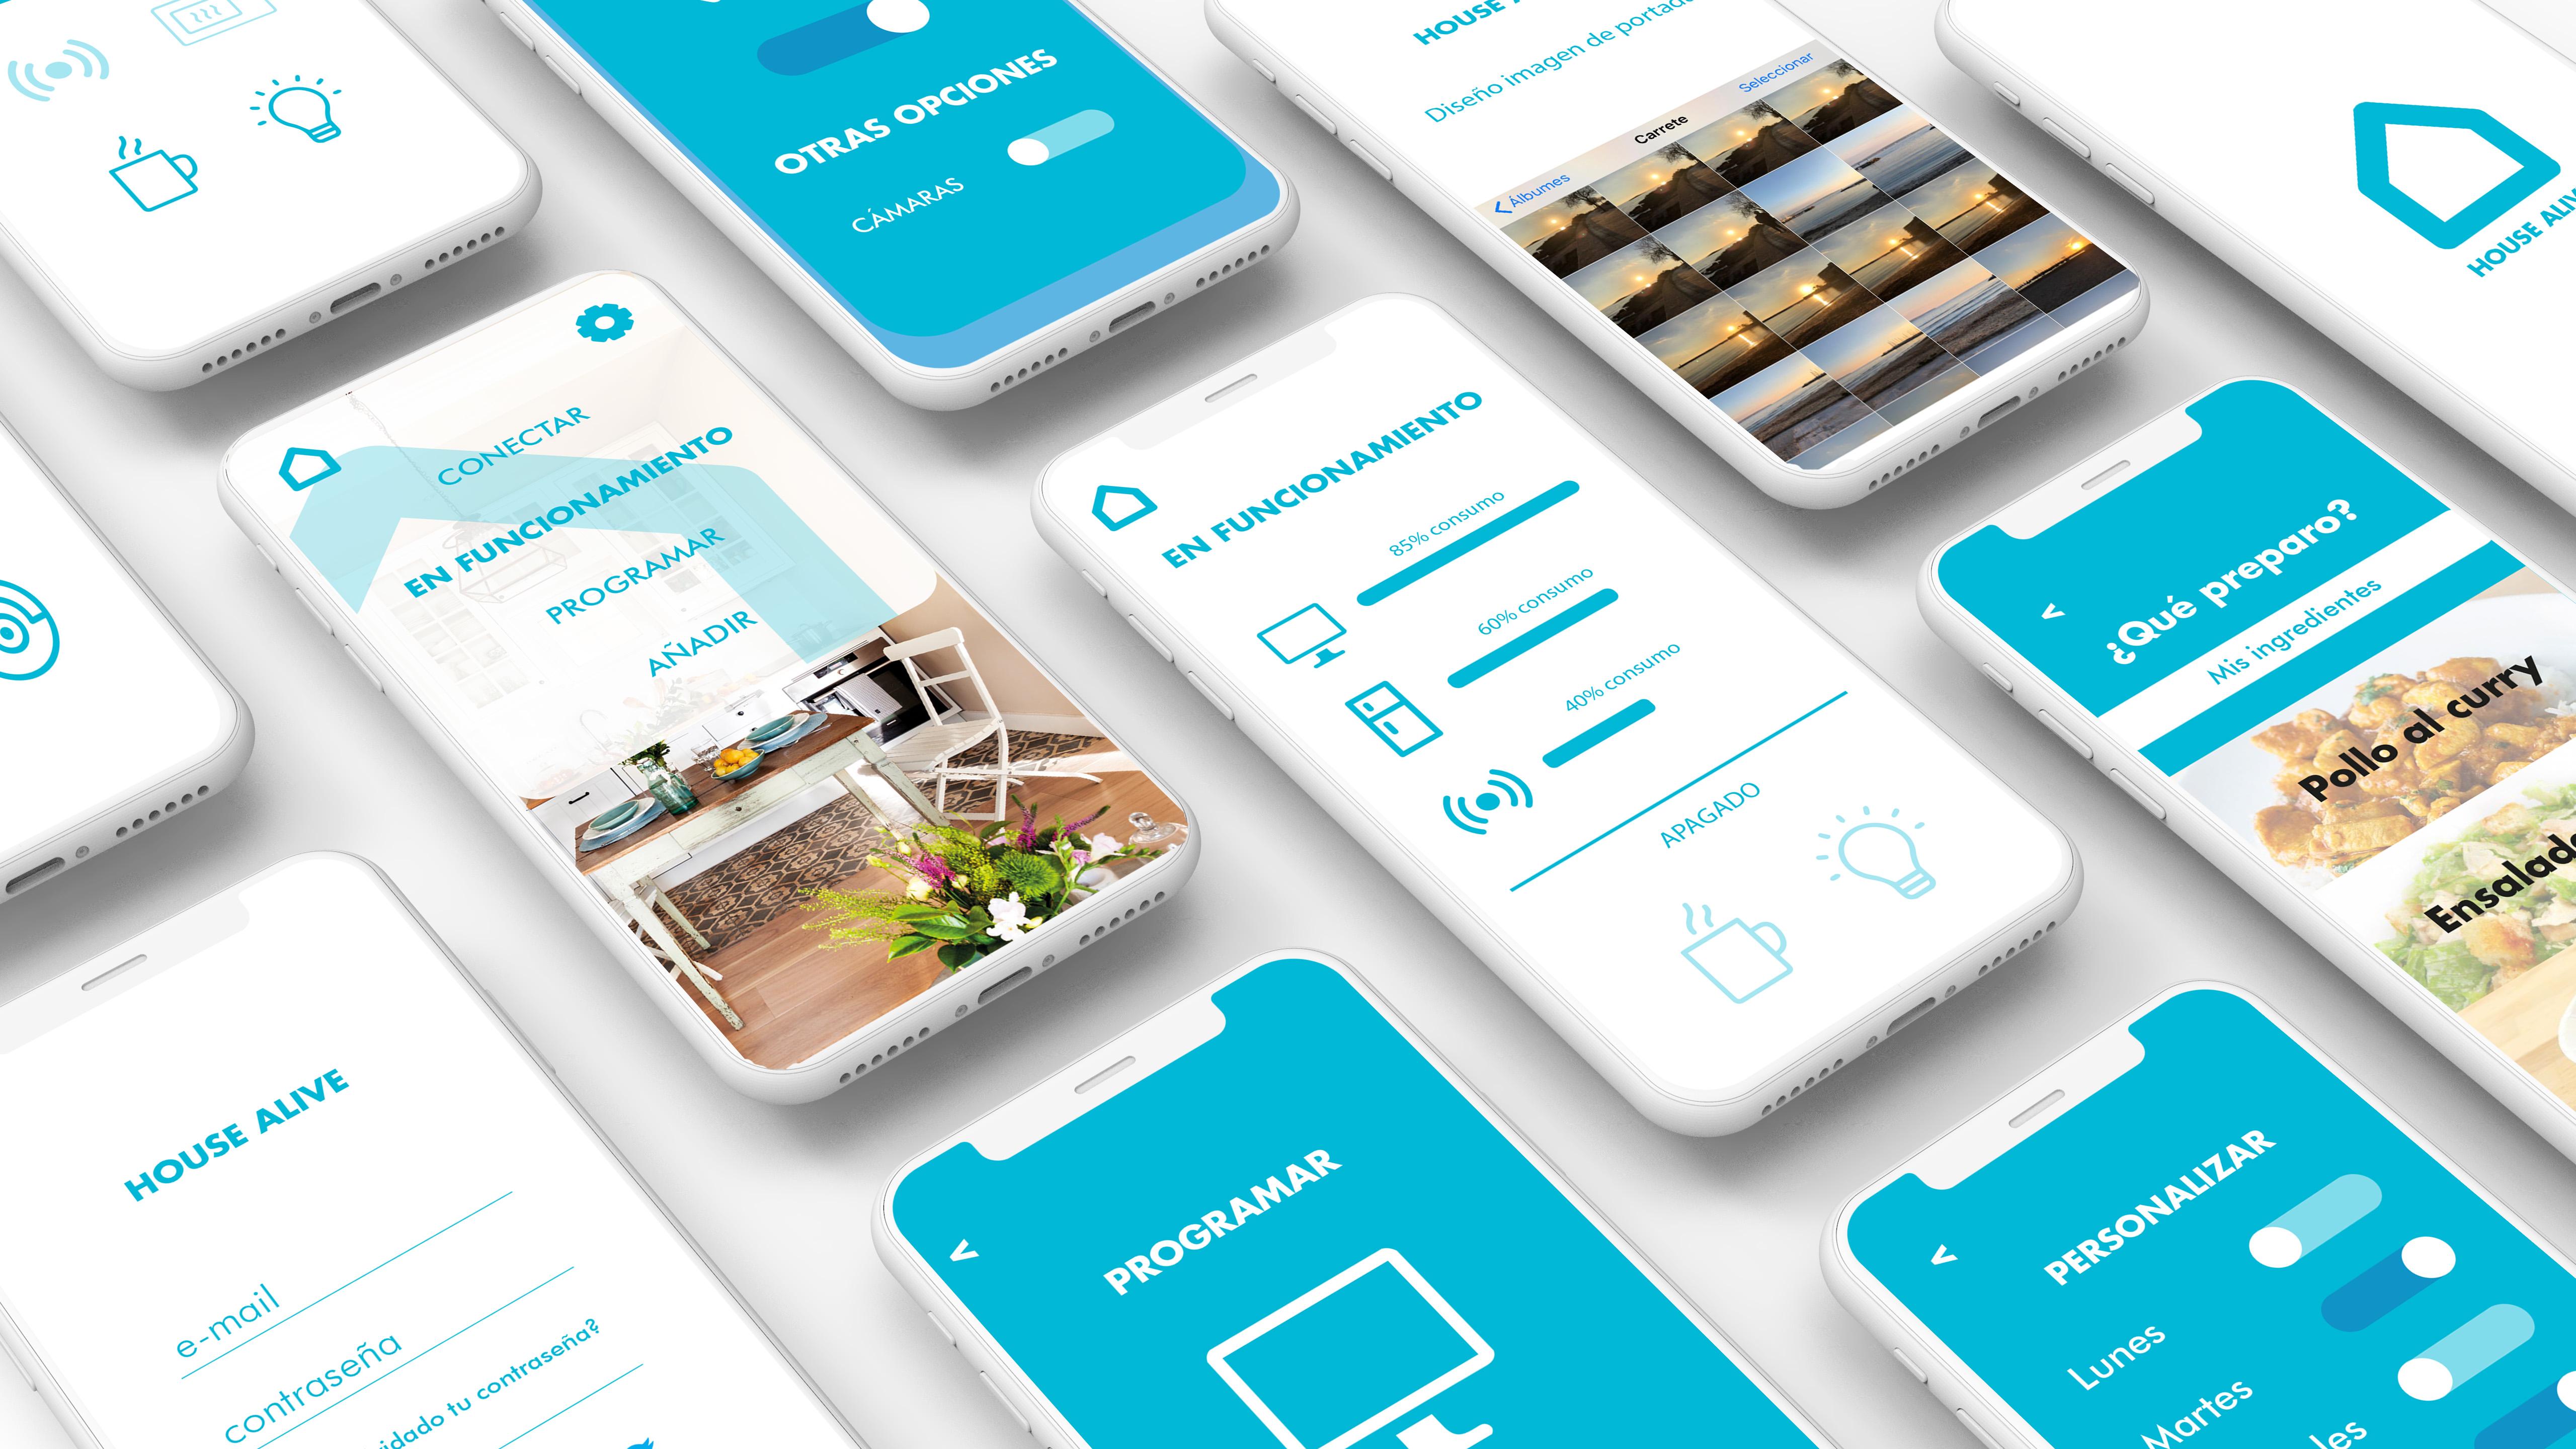 App del hogar: House Alive by Nerea Vidal Muñoz - Creative Work